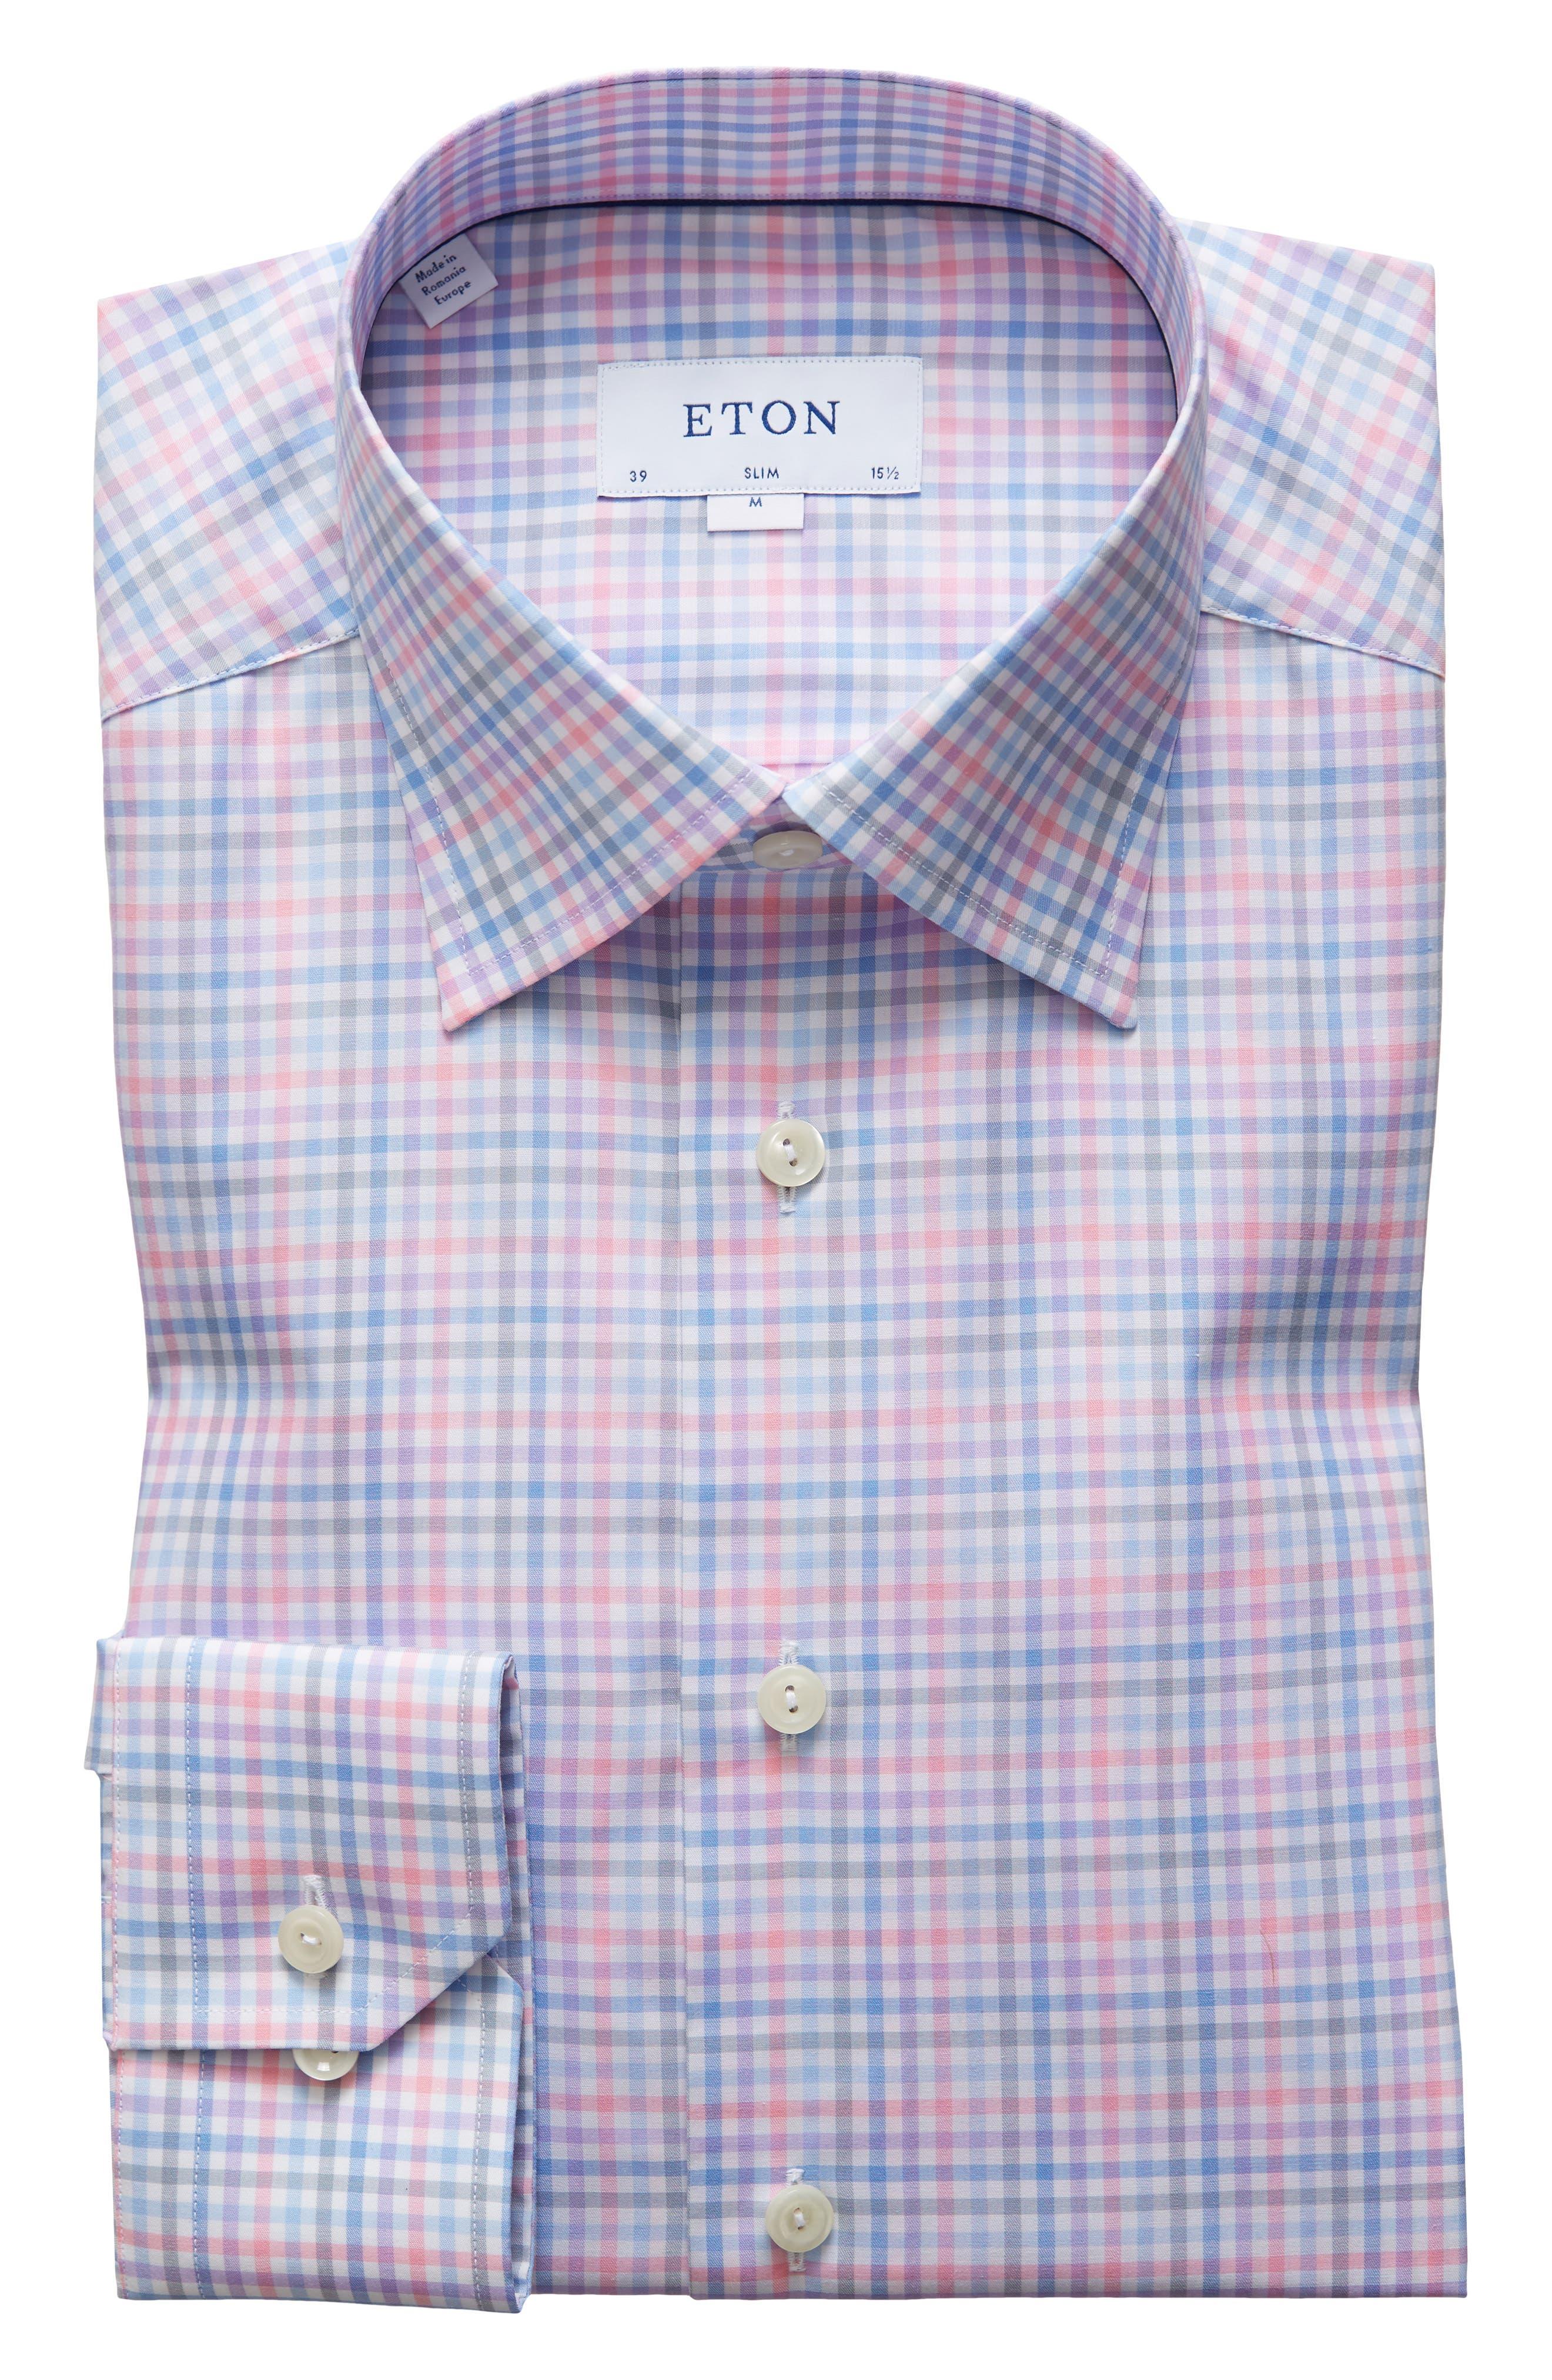 Image of Eton Plaid Extra Slim Fit Dress Shirt